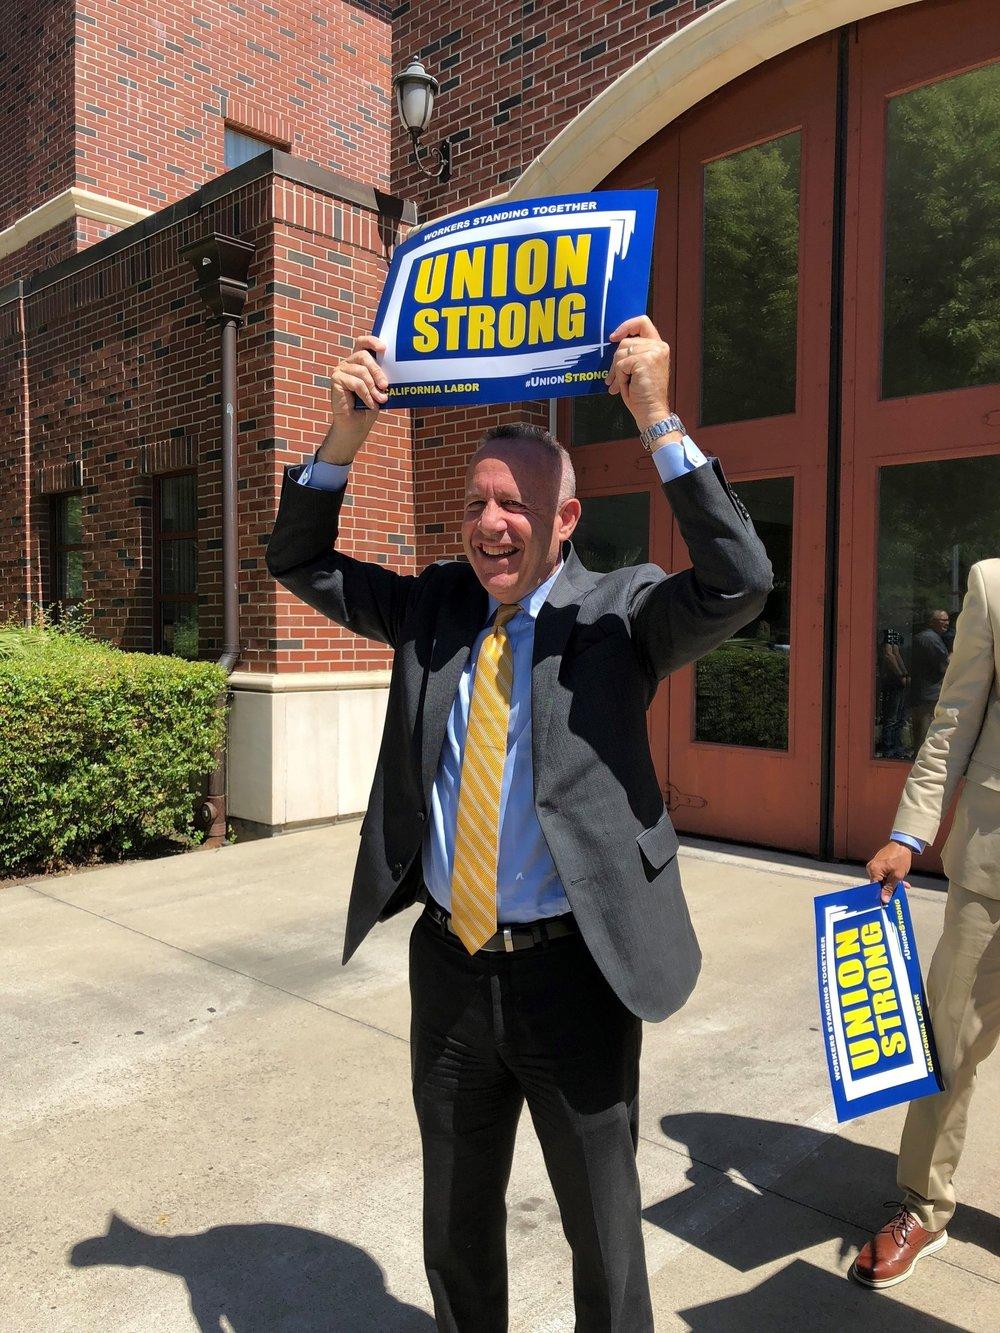 mayor with union sign.jpg